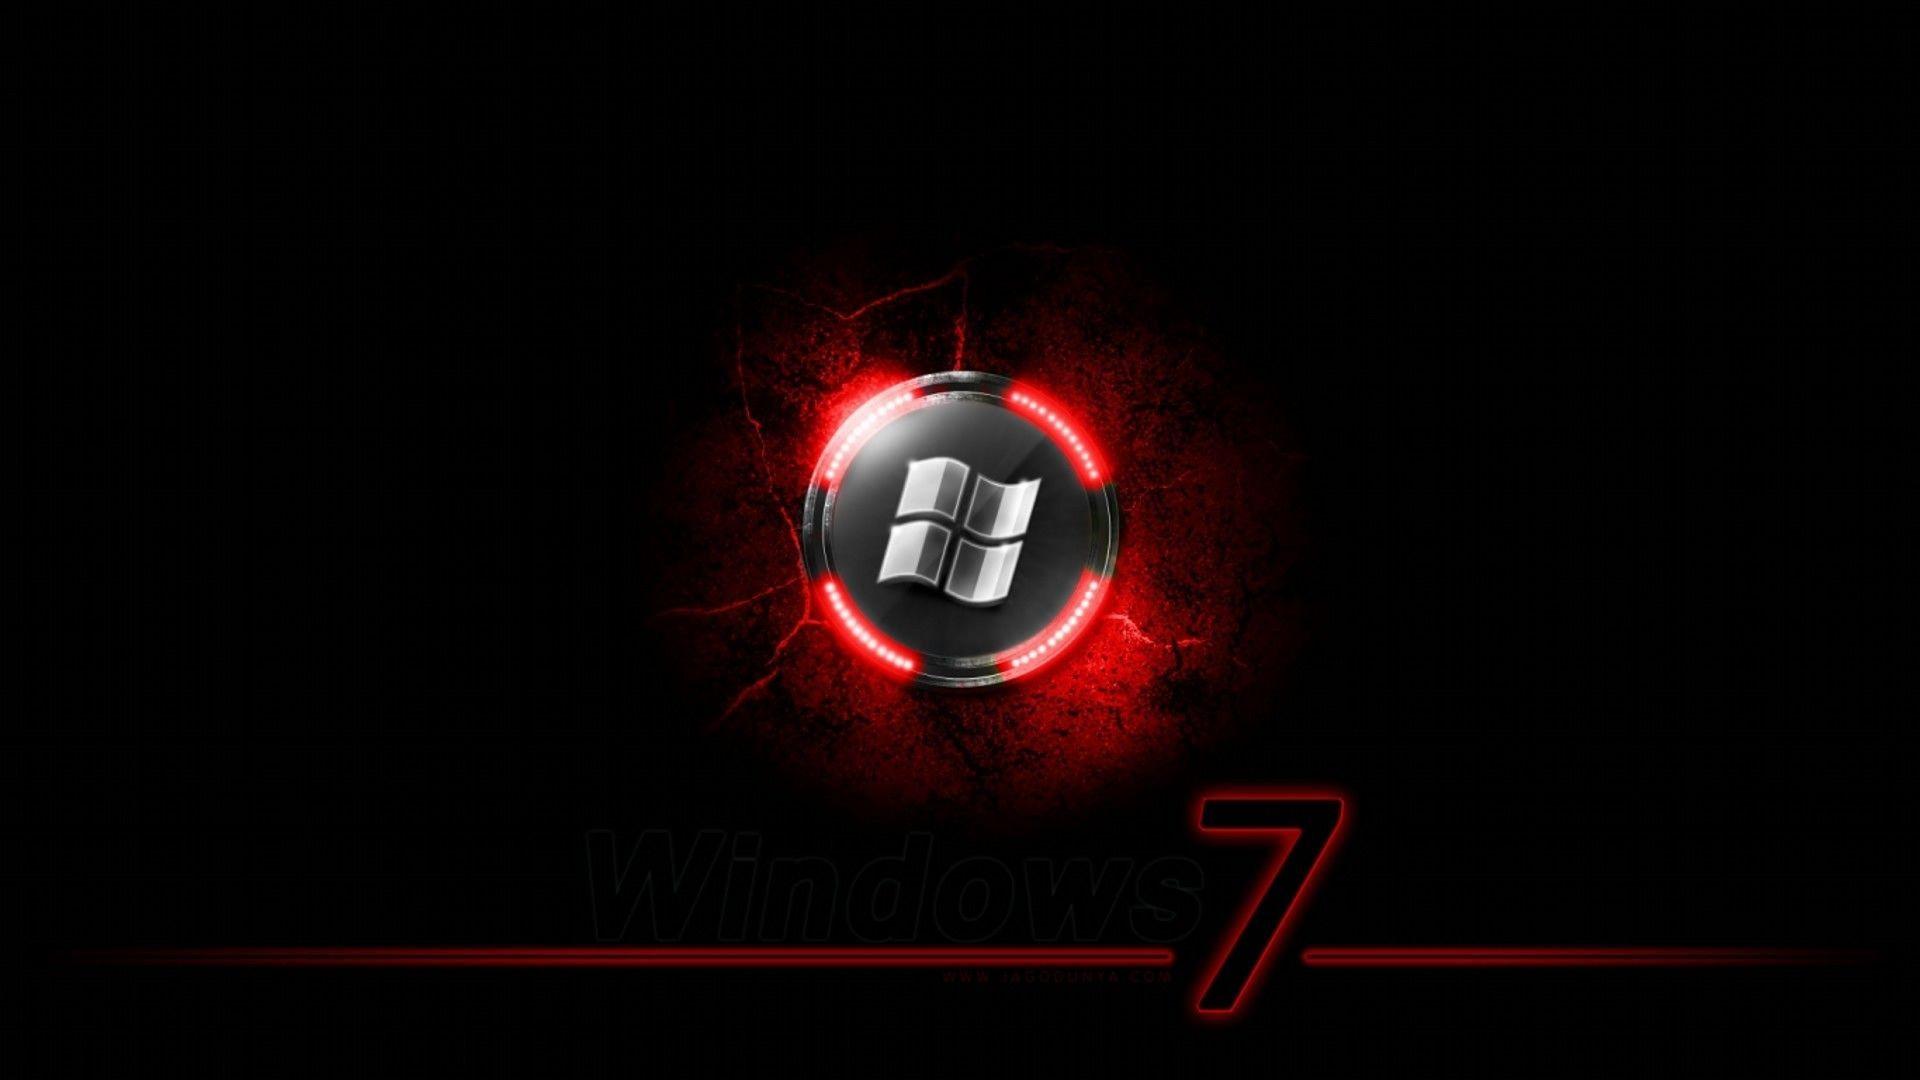 Windows 7 Black N Red Wallpaper 4k Samsung Wallpaper Full Hd Wallpaper Red Wallpaper